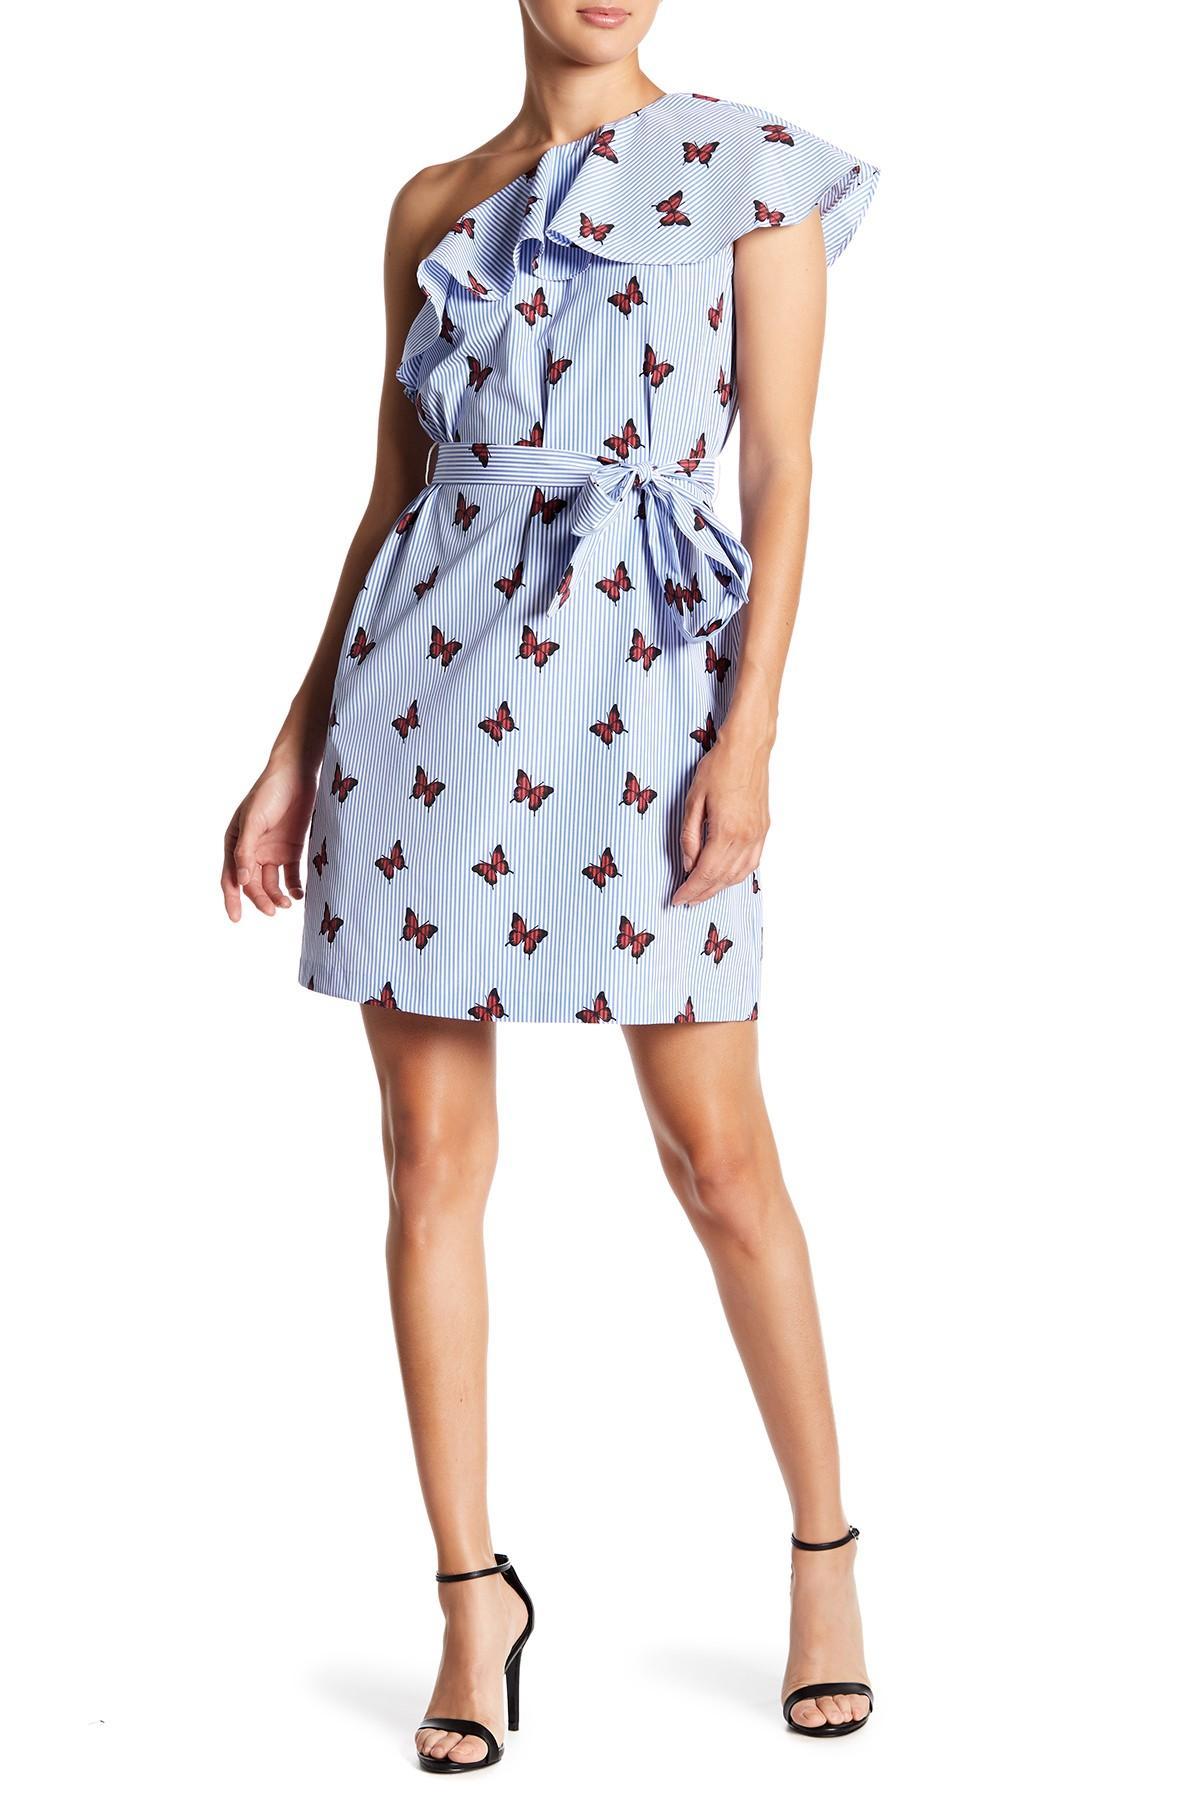 91b70ef9465 Lyst - Donna Morgan One-shoulder Butterfly Ruffle Dress in Blue